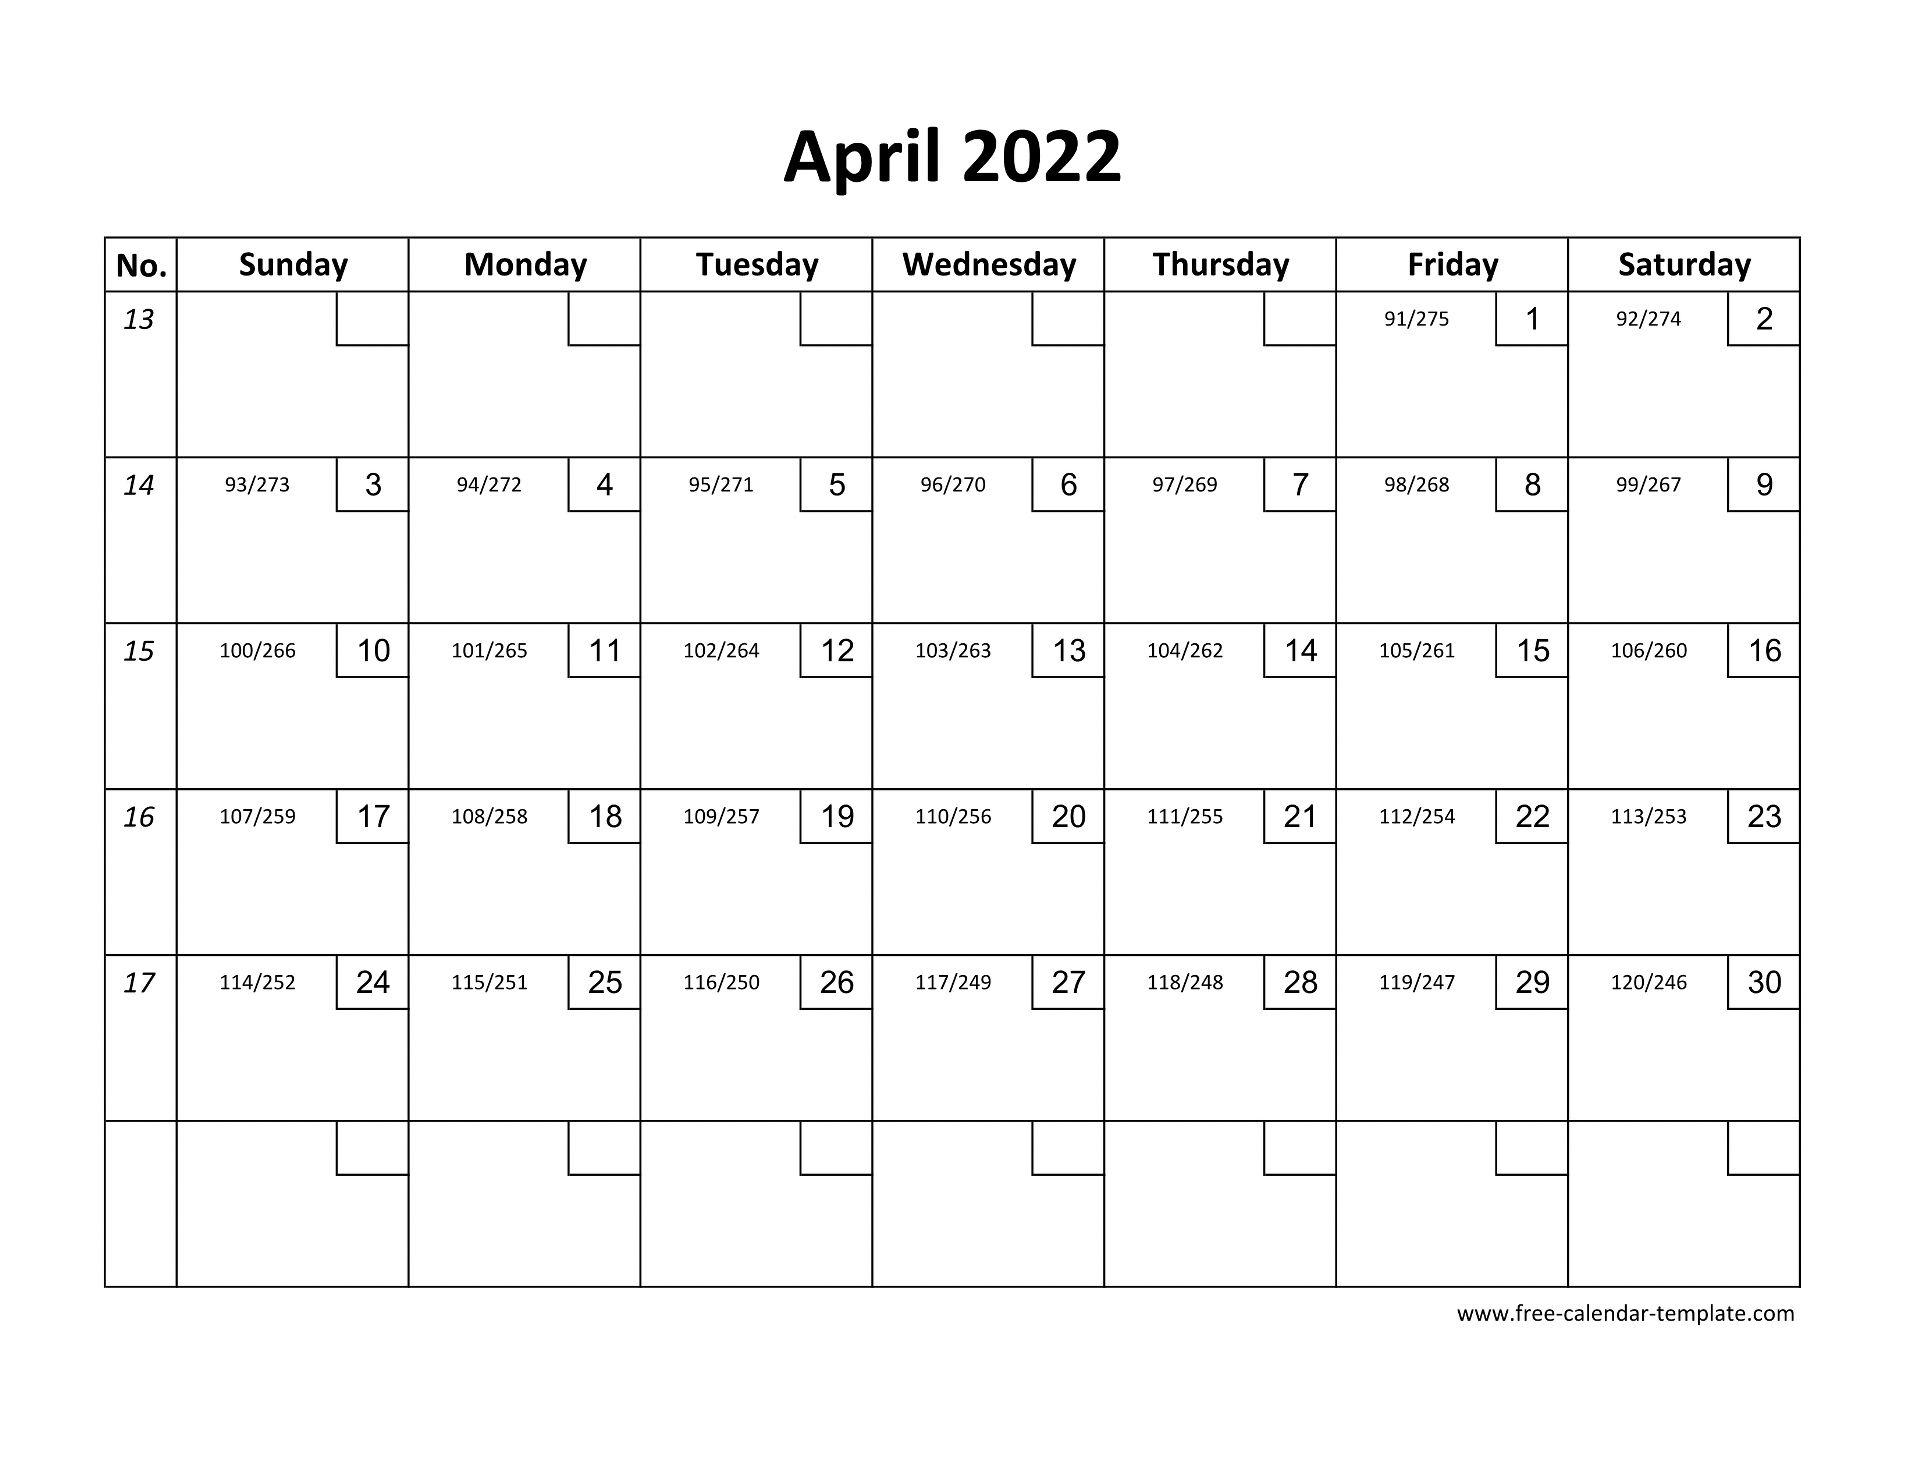 April 2022 Free Calendar Tempplate   Free-calendar ...